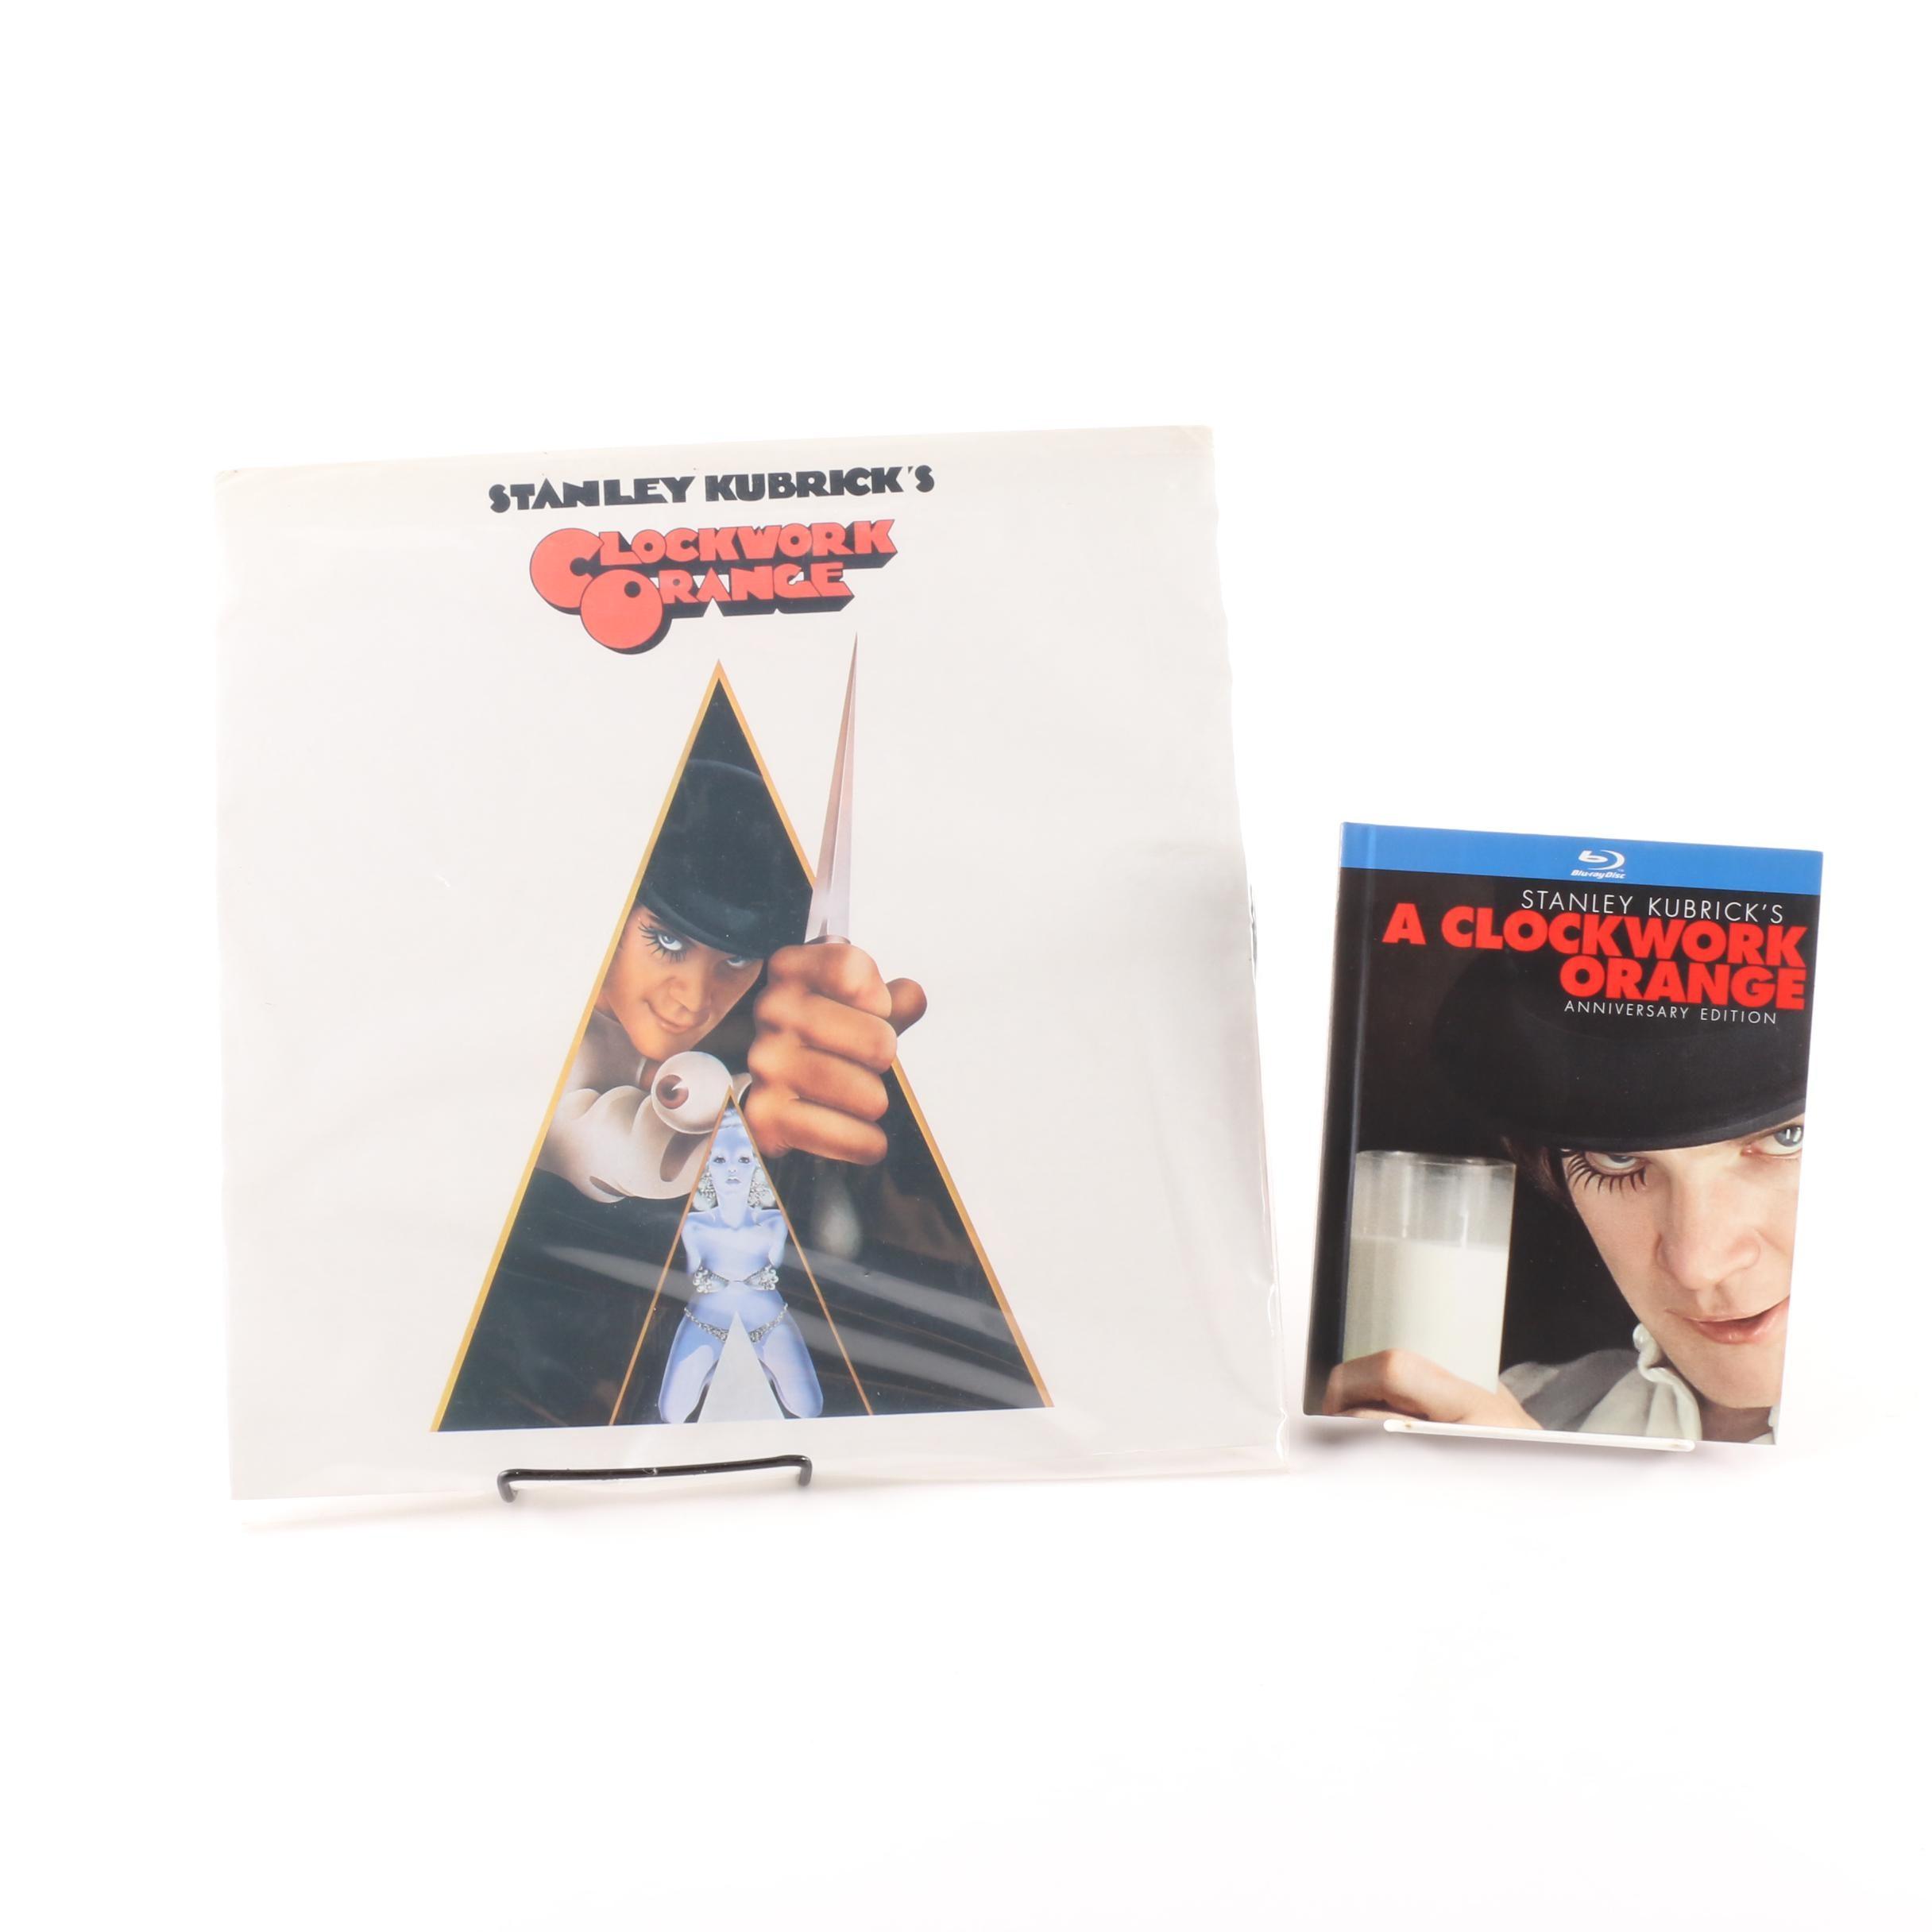 """A Clockwork Orange"" Soundtrack Record and Anniversary Edition Blu-Ray"